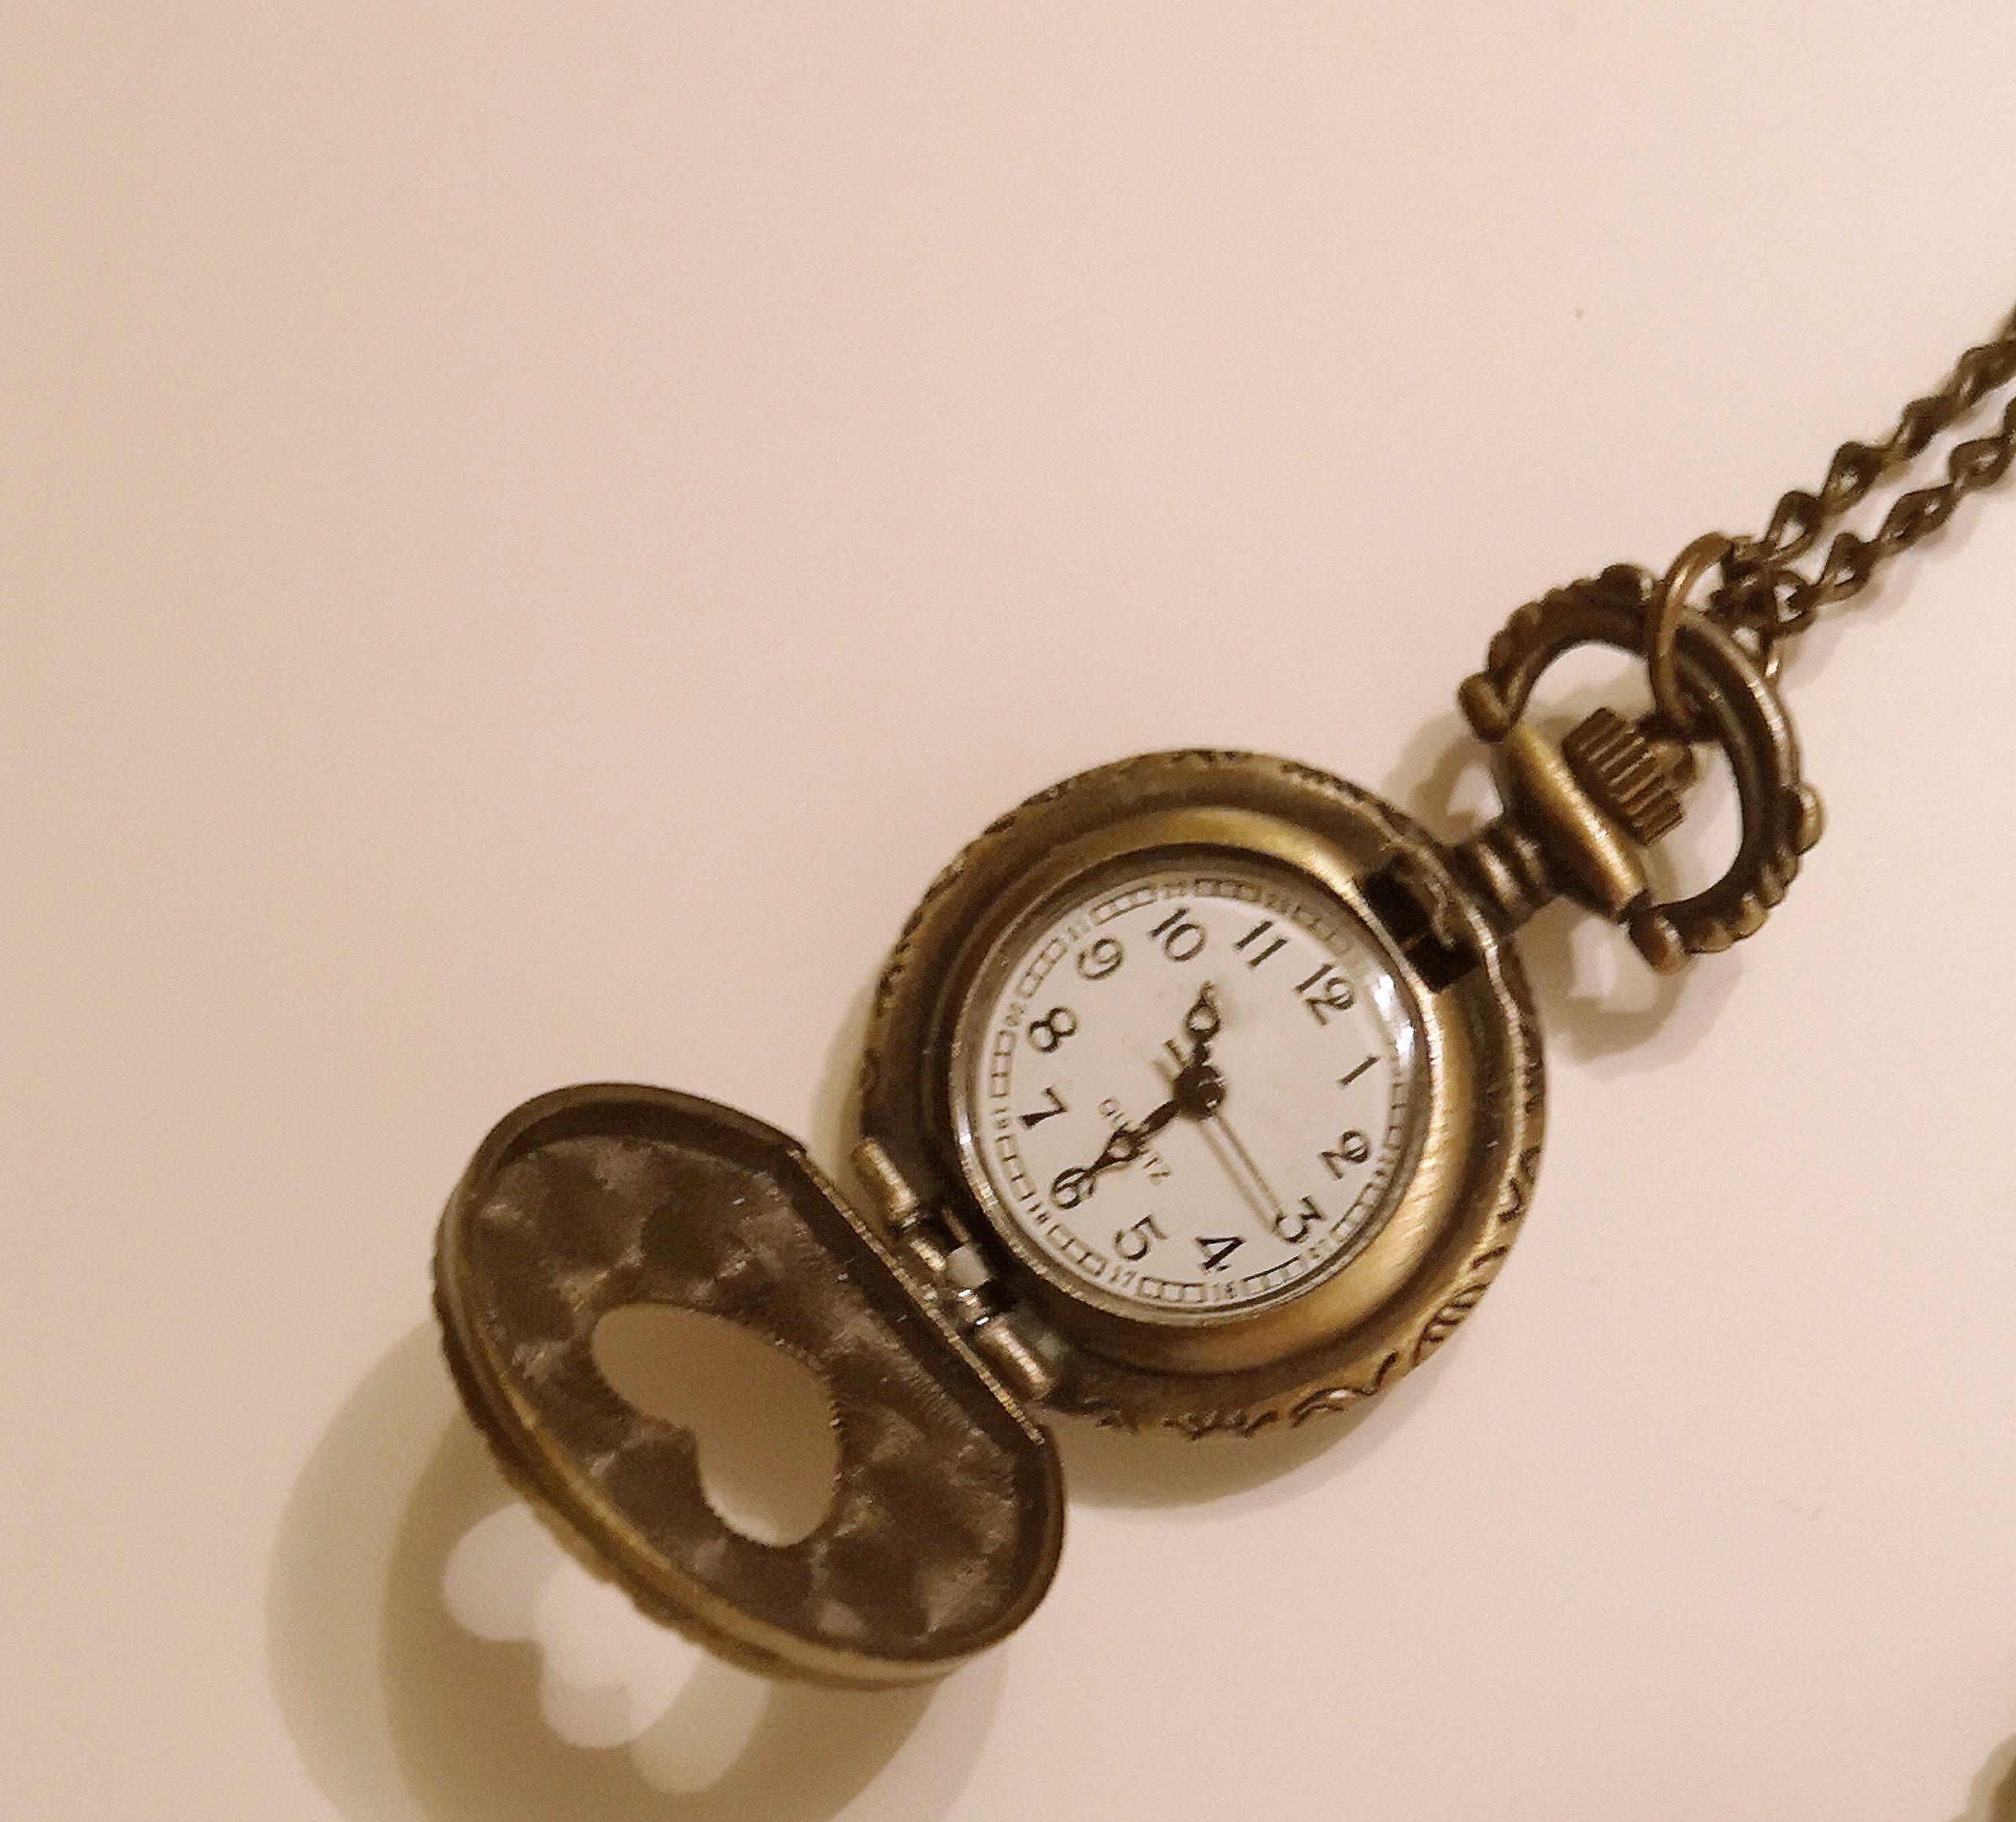 Uhr scaled